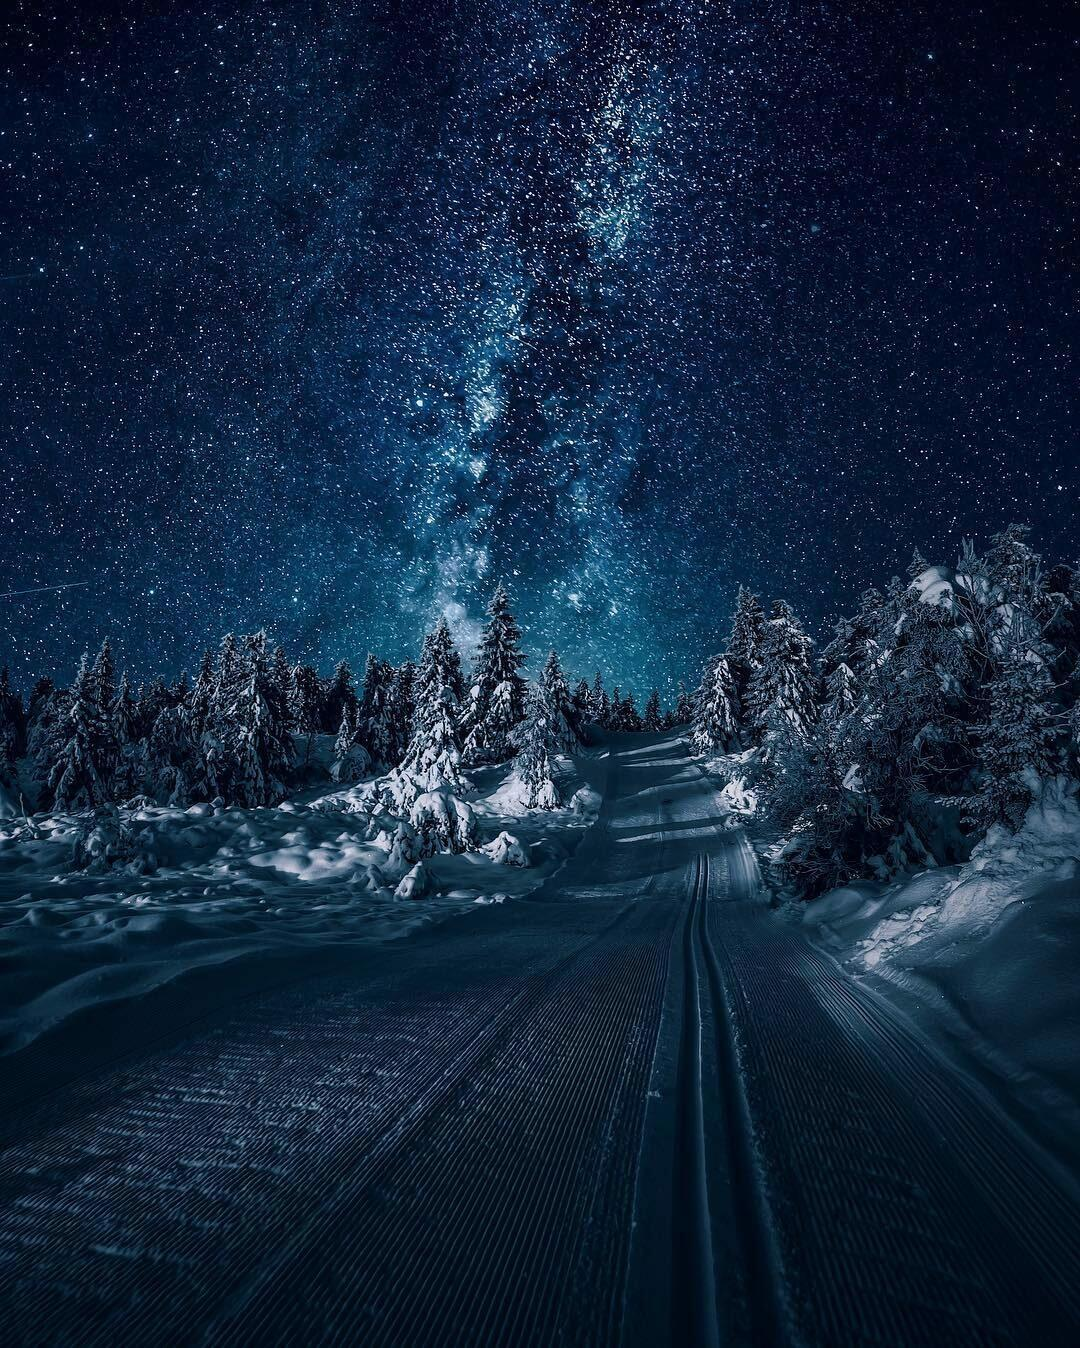 свете фото на телефон снег очень